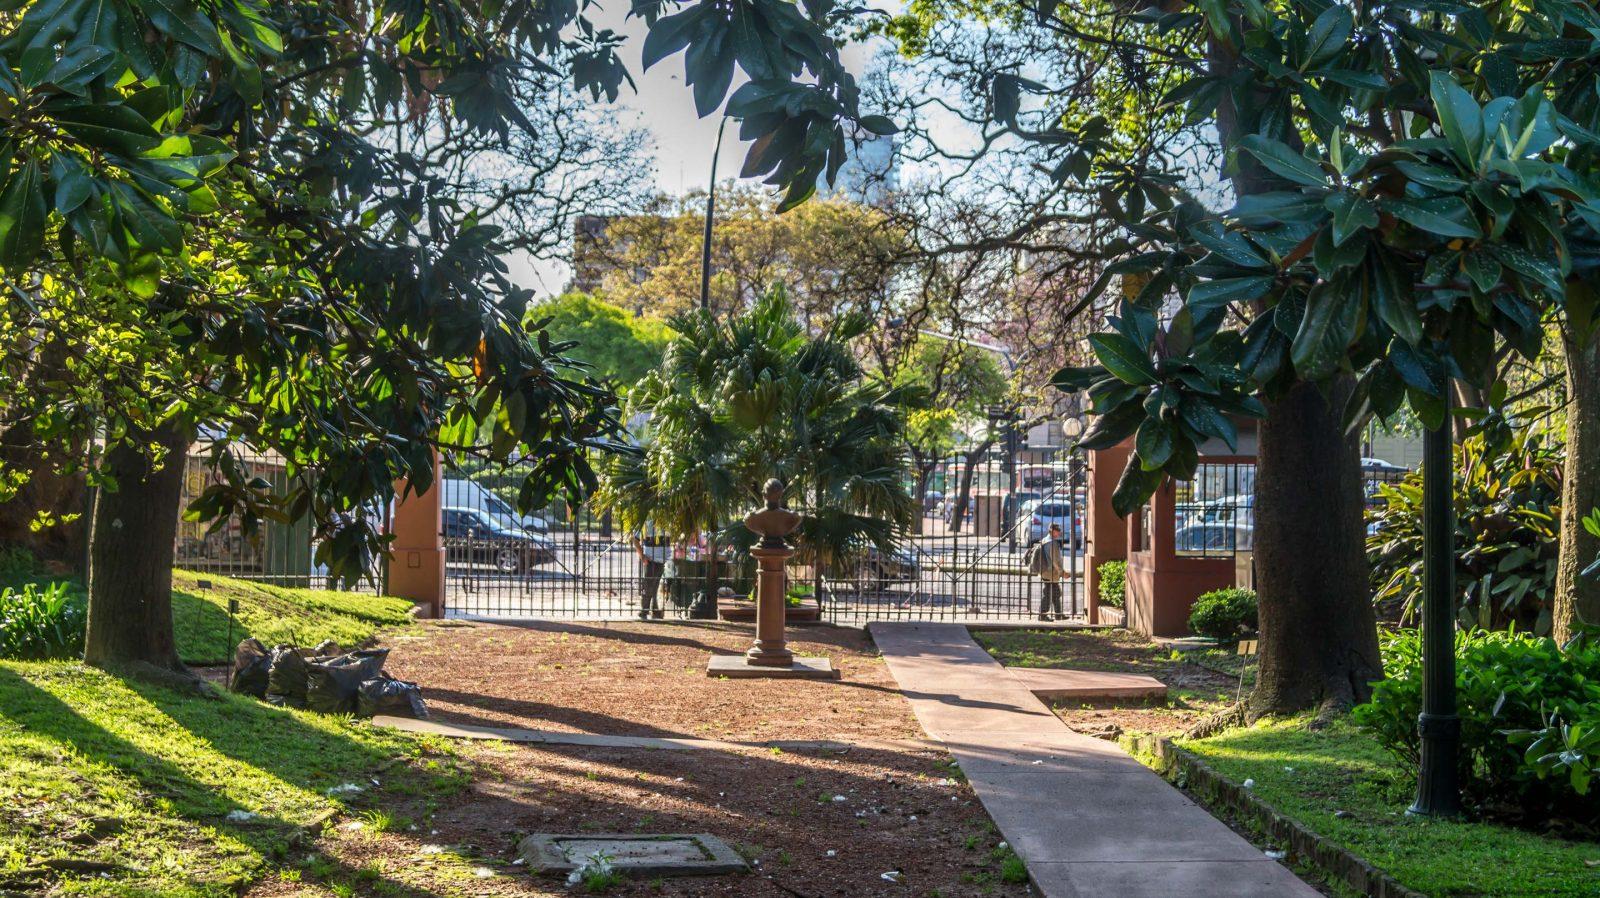 Buenos Aires Botanical Garden Jardin Botanico Podr